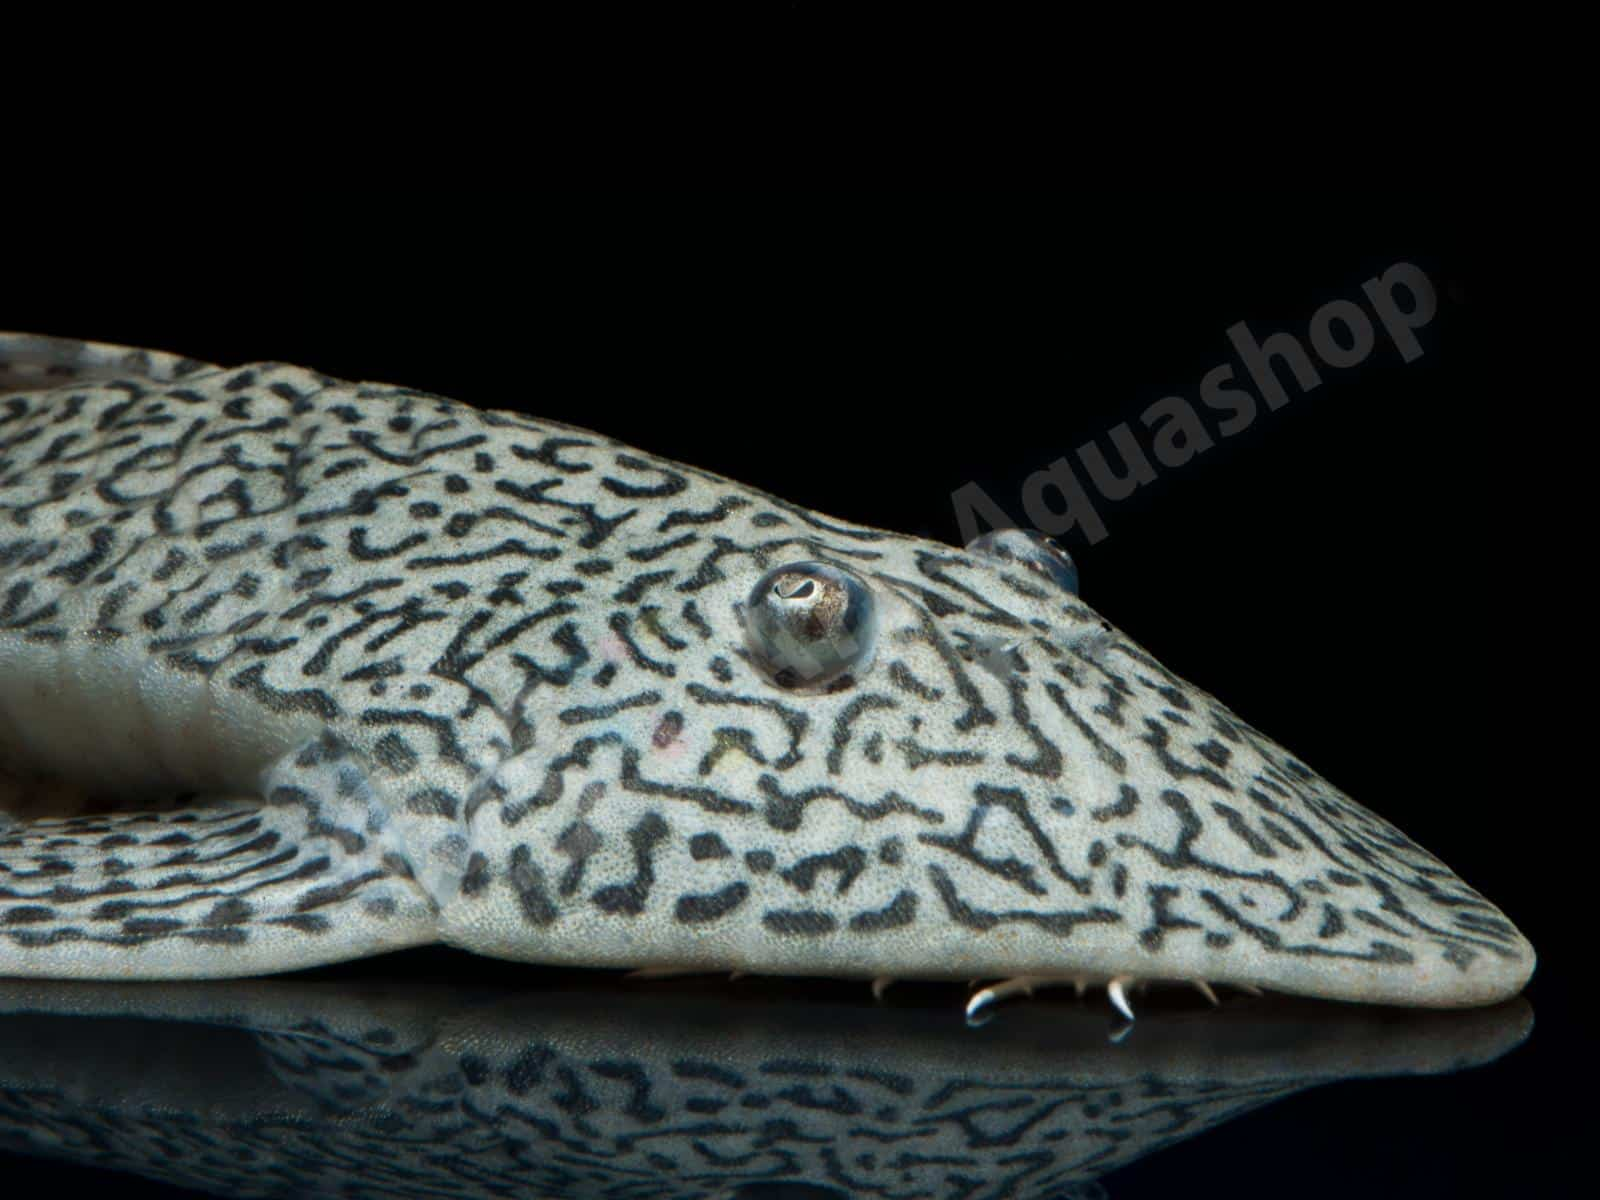 pseudohemiodon apithanos enrico richter 0258 10